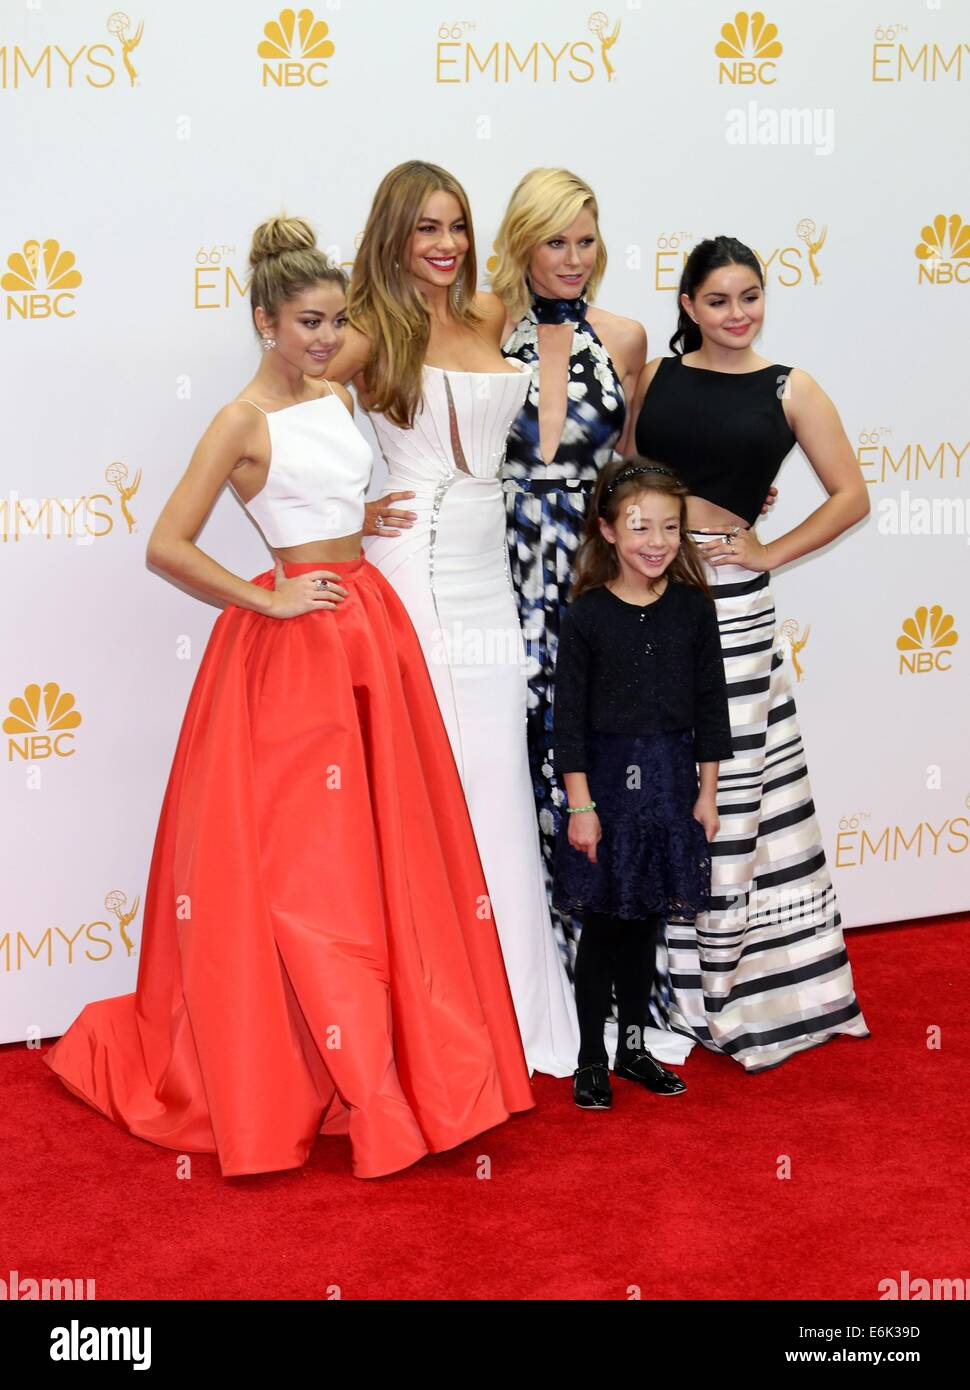 Modern Family Series Cast Stock Photos & Modern Family Series Cast